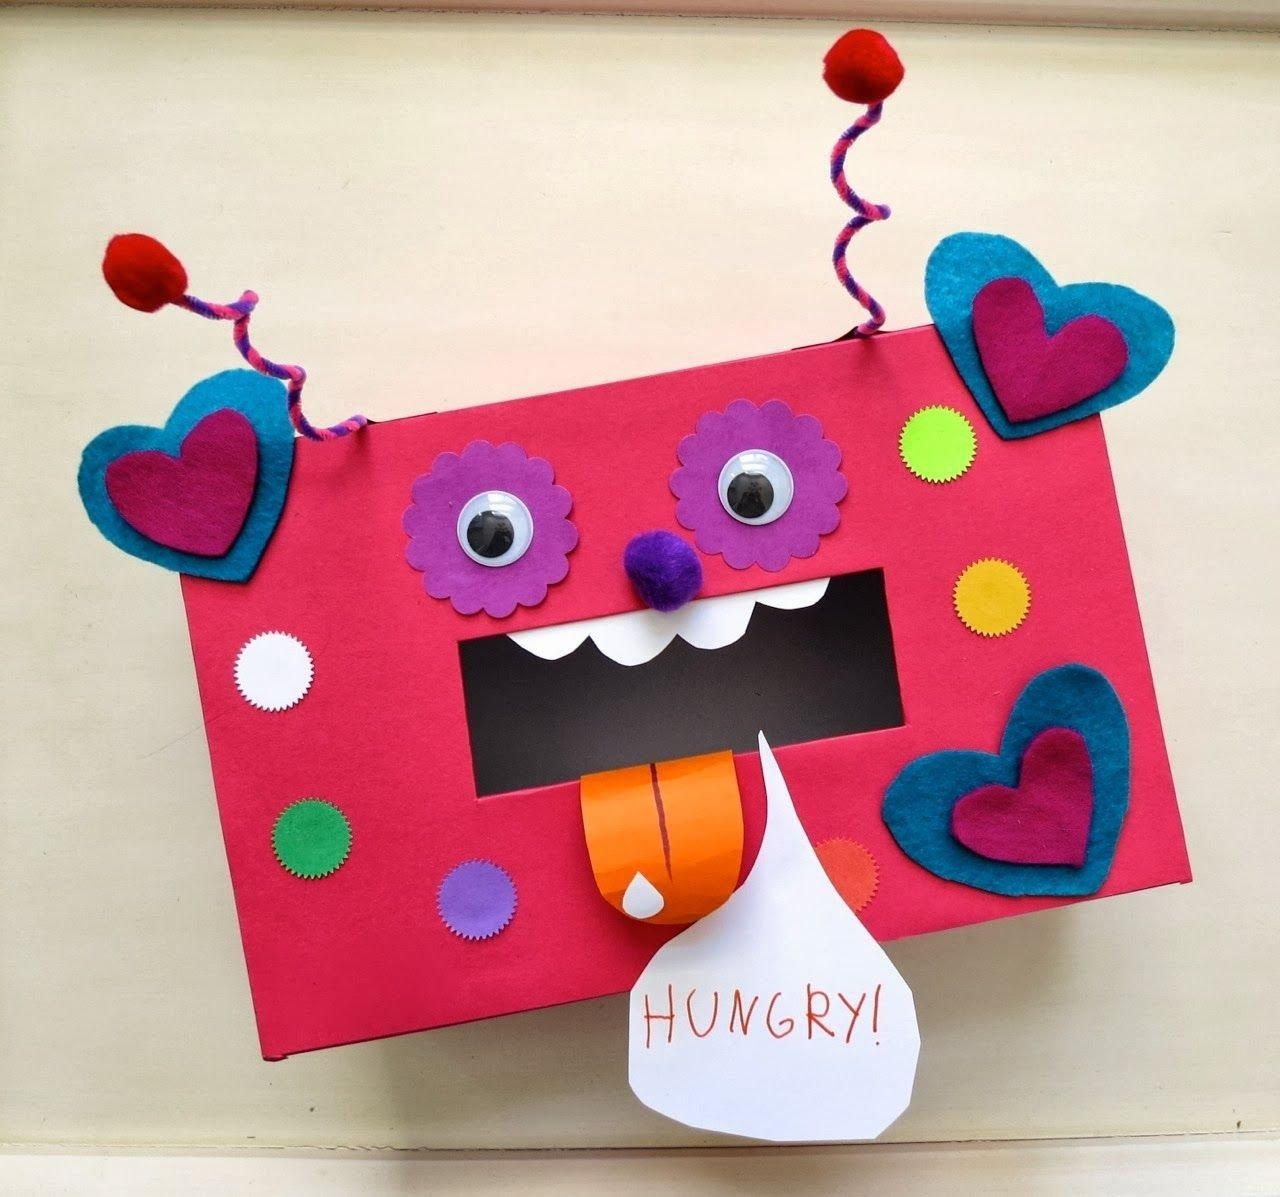 10 Stylish Valentine Shoe Box Decorating Ideas valentine shoe box decorating ideas mmmcrafts shoebox valentine 2021